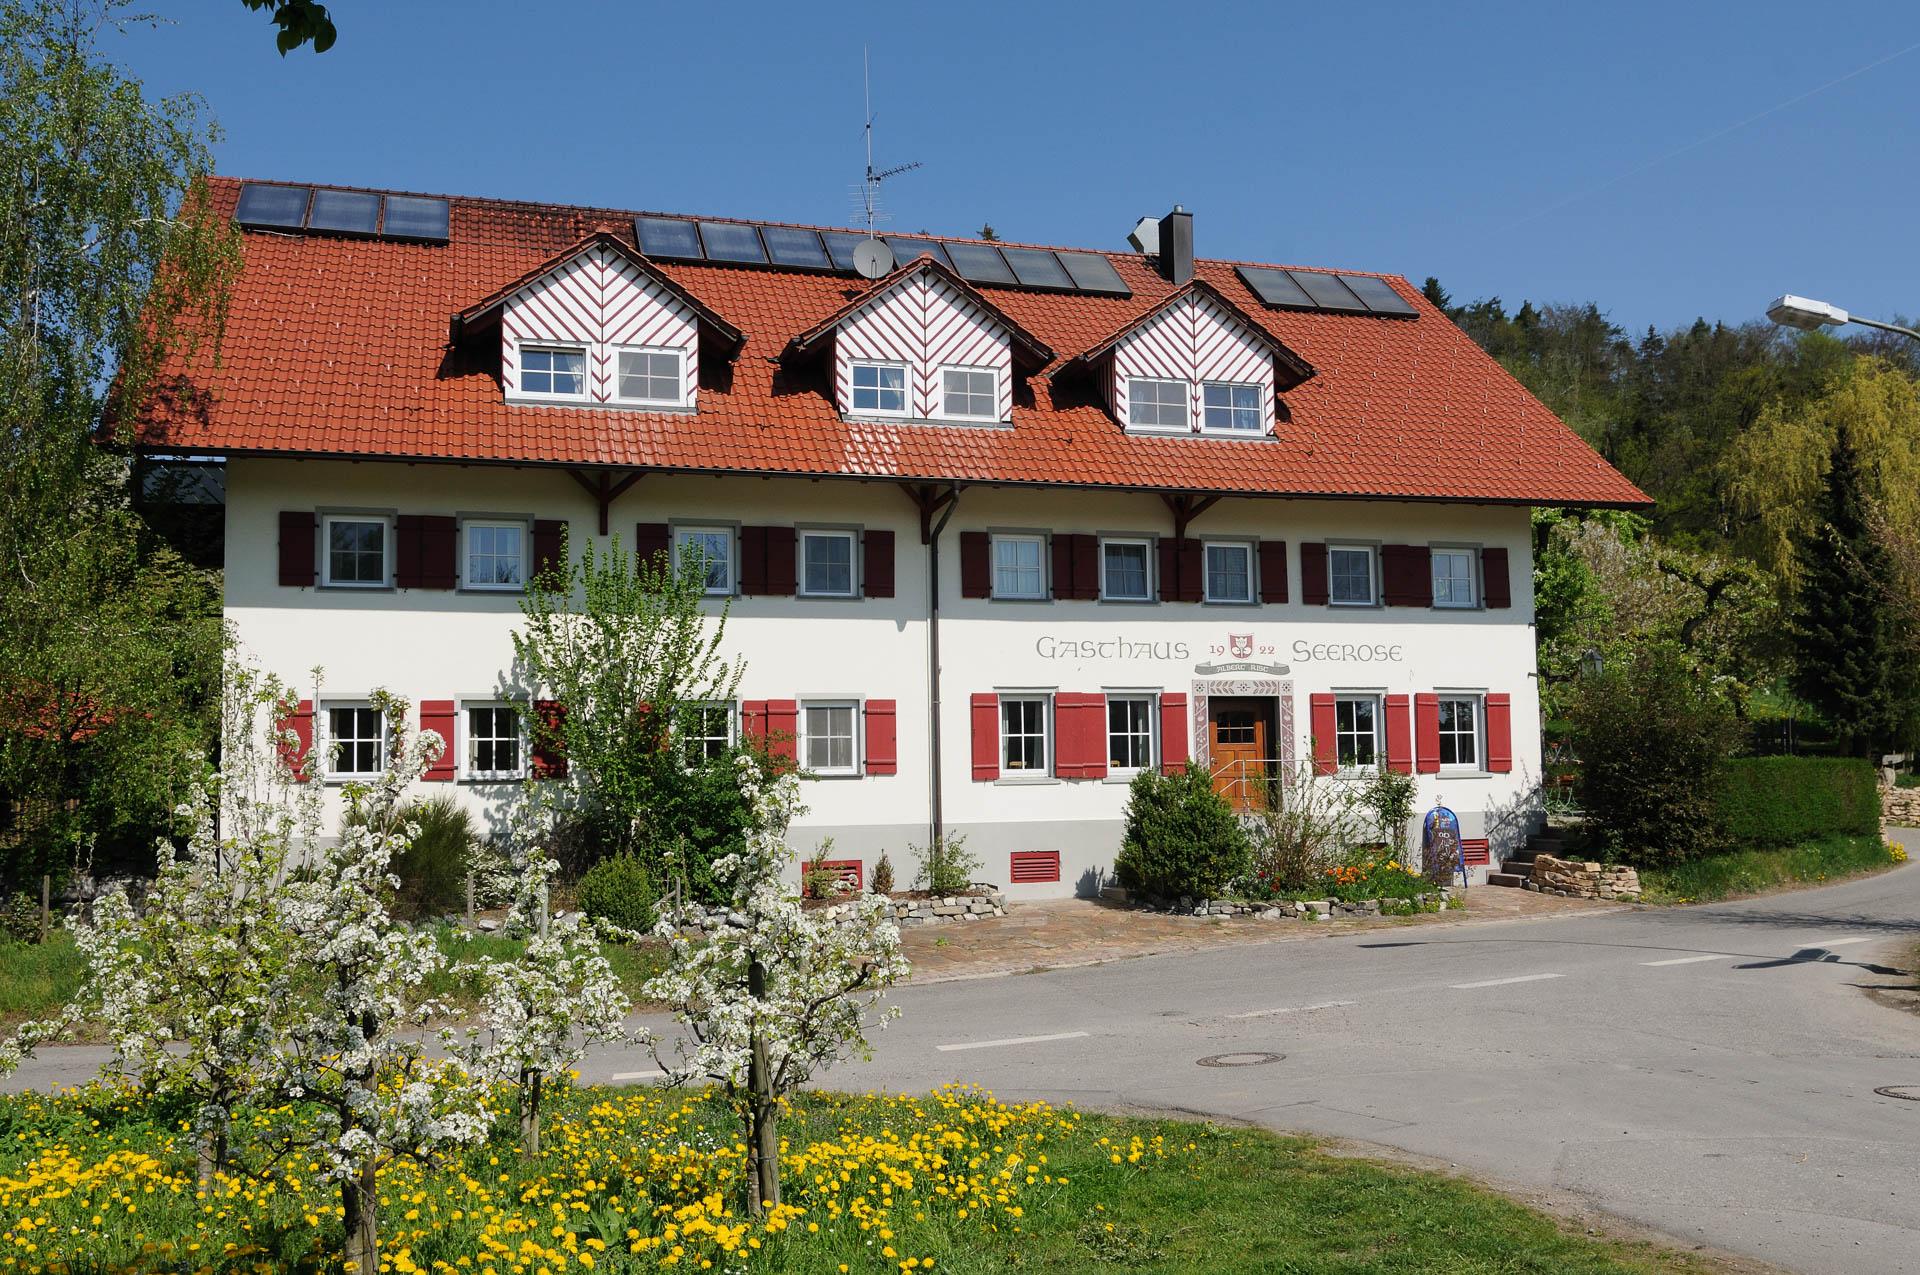 Traumhaft gelegen, das Gasthaus Seerose bei Kressbronn am Bodensee